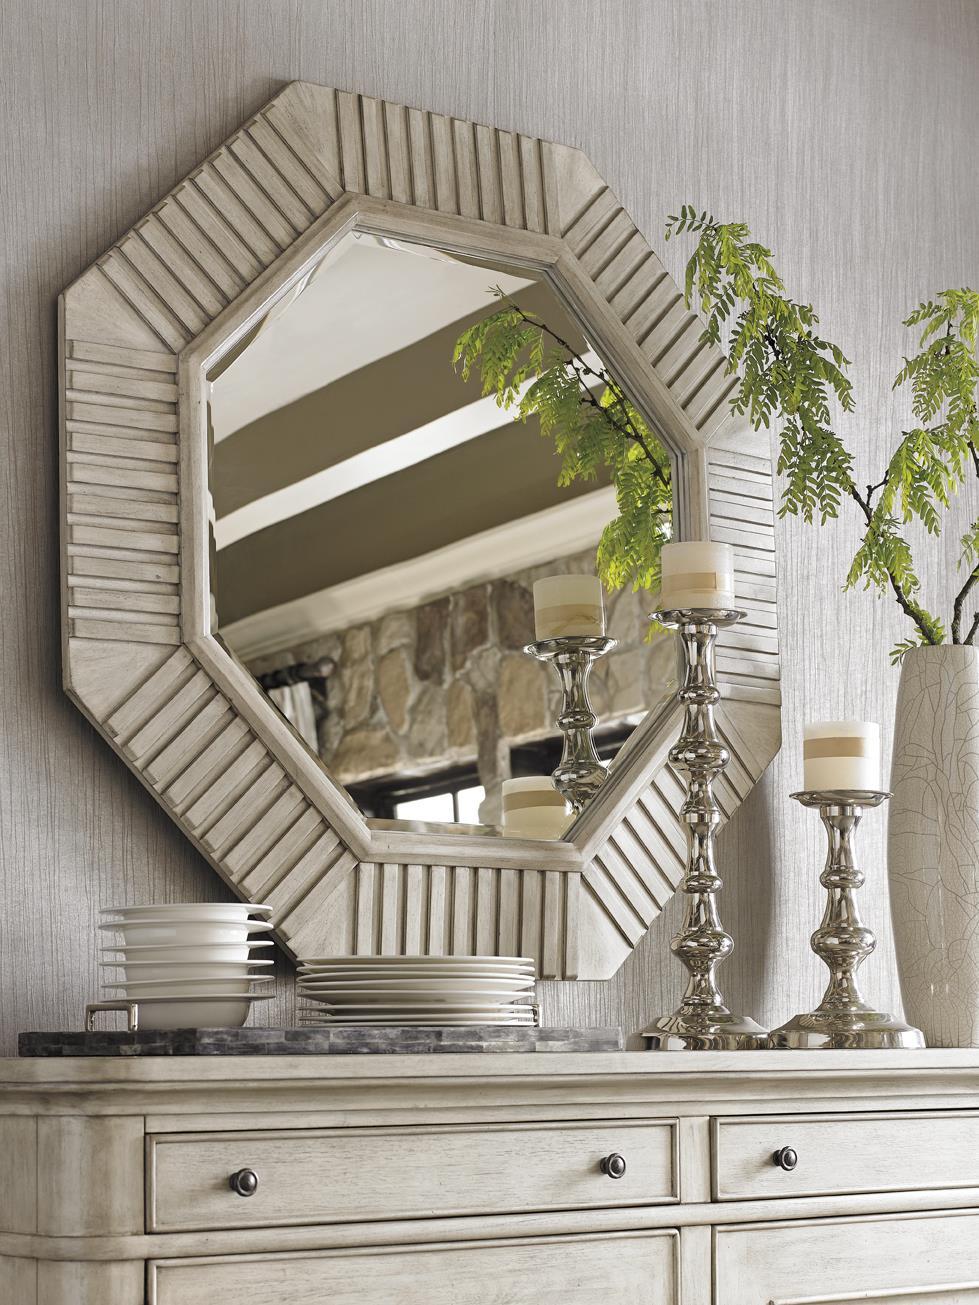 Lexington Oyster Bay 714 204 Selden Octagonal Mirror With